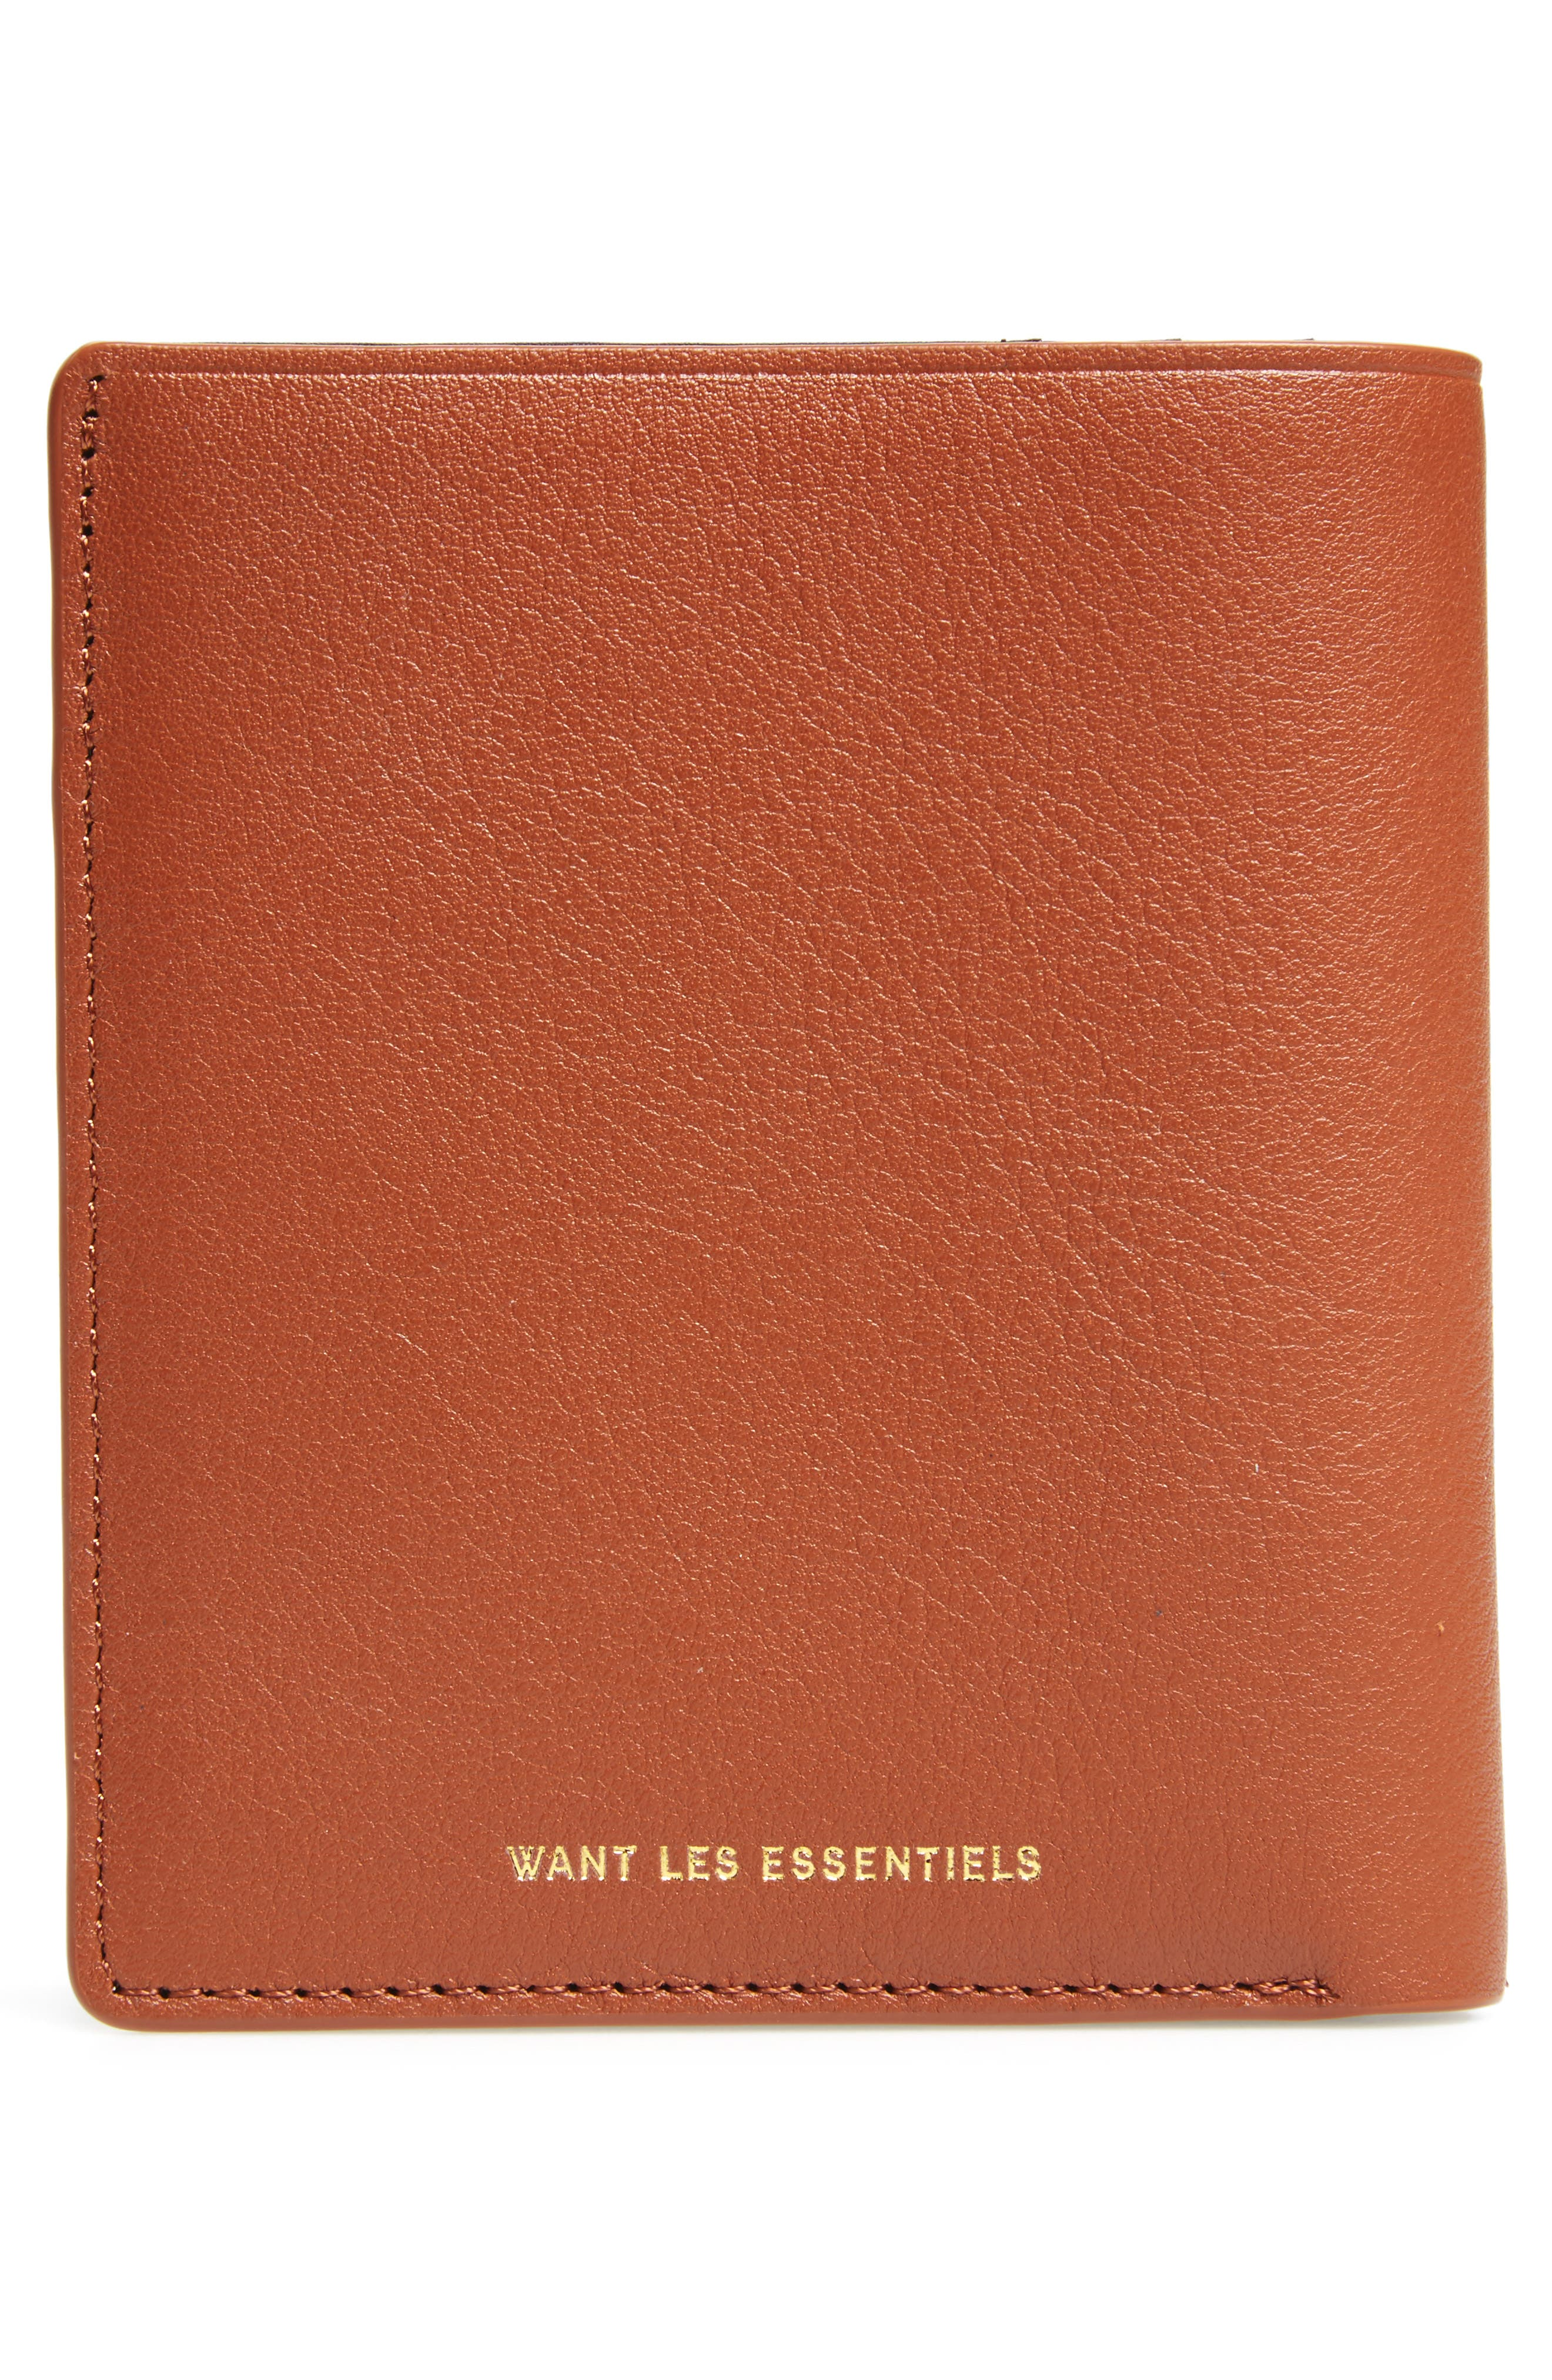 Alternate Image 3  - WANT LES ESSENTIELS Bradley Bifold Leather Wallet